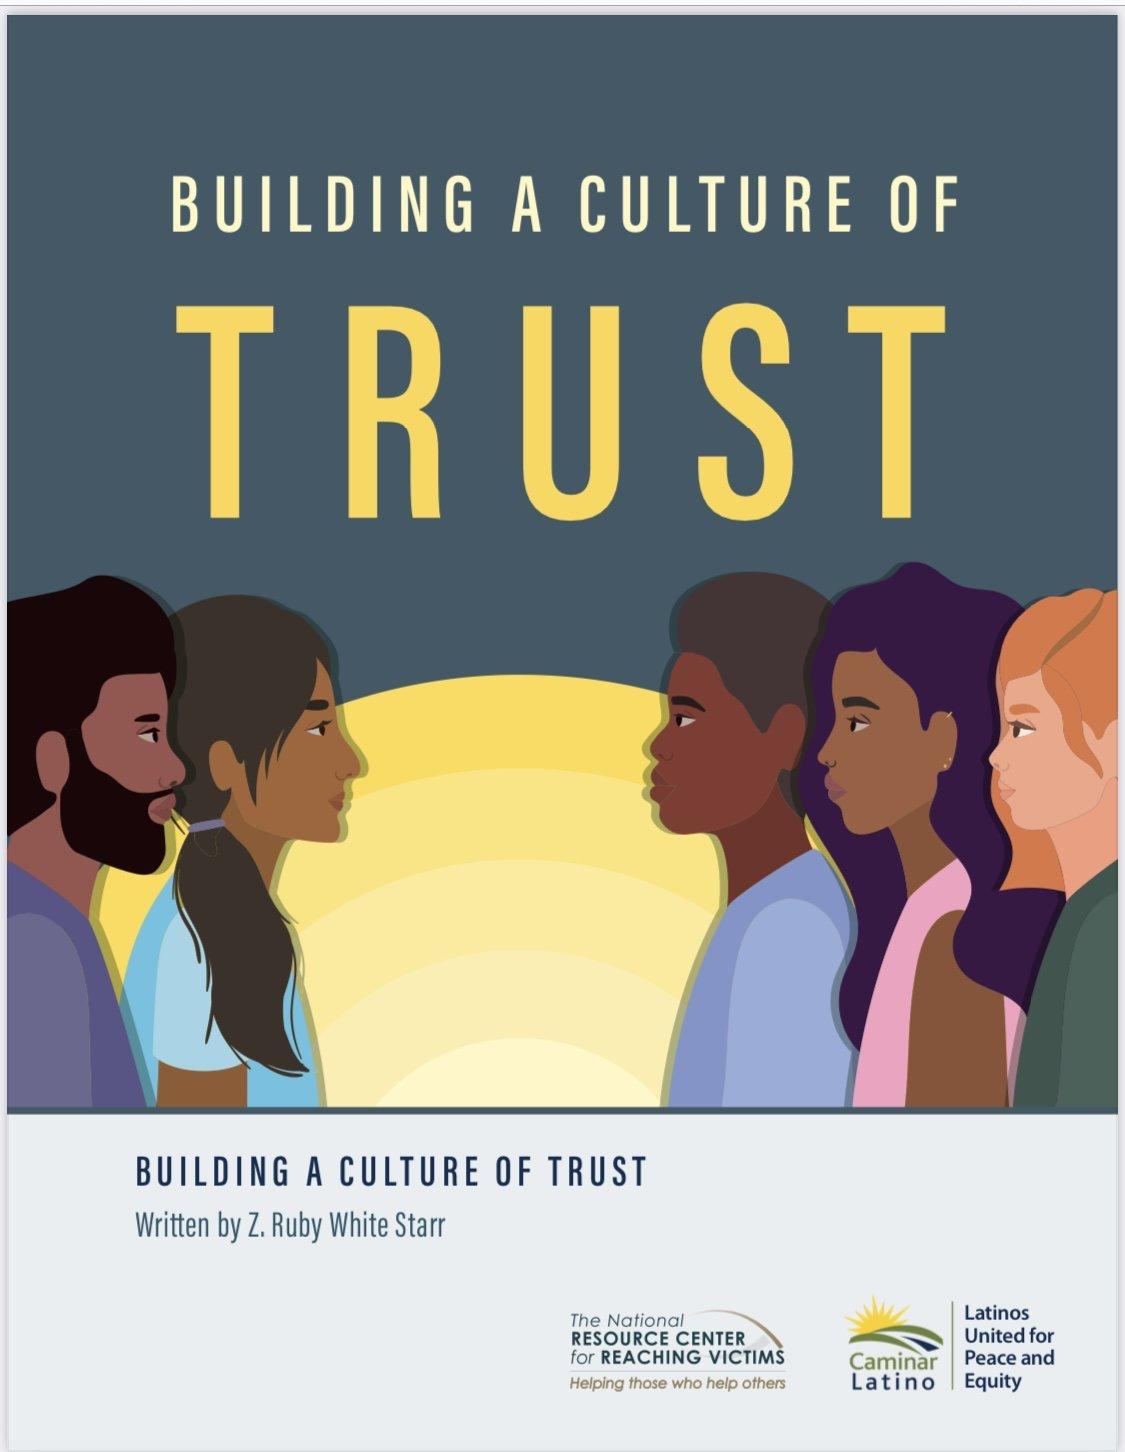 Building a Culture of Trust